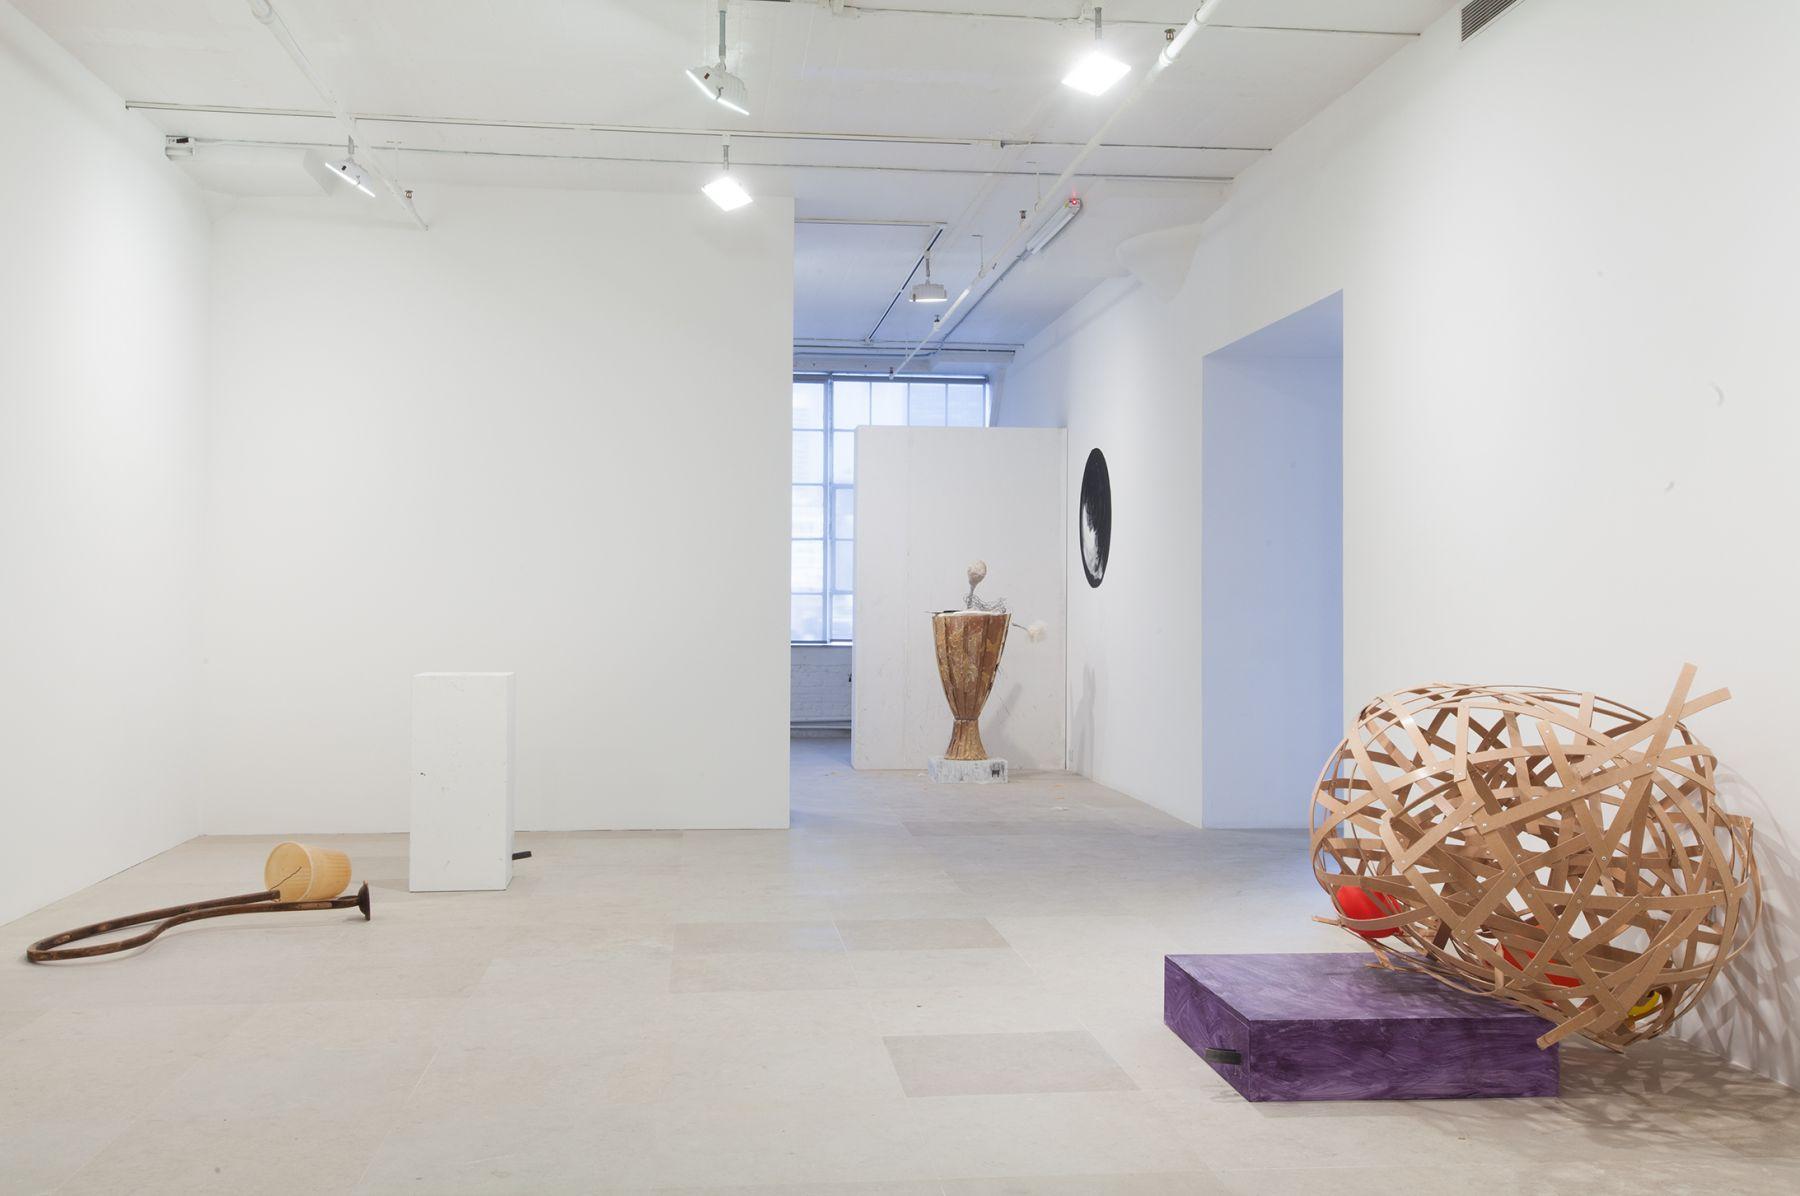 Installation view, The Fall Show, Greene Naftali, New York, 2012